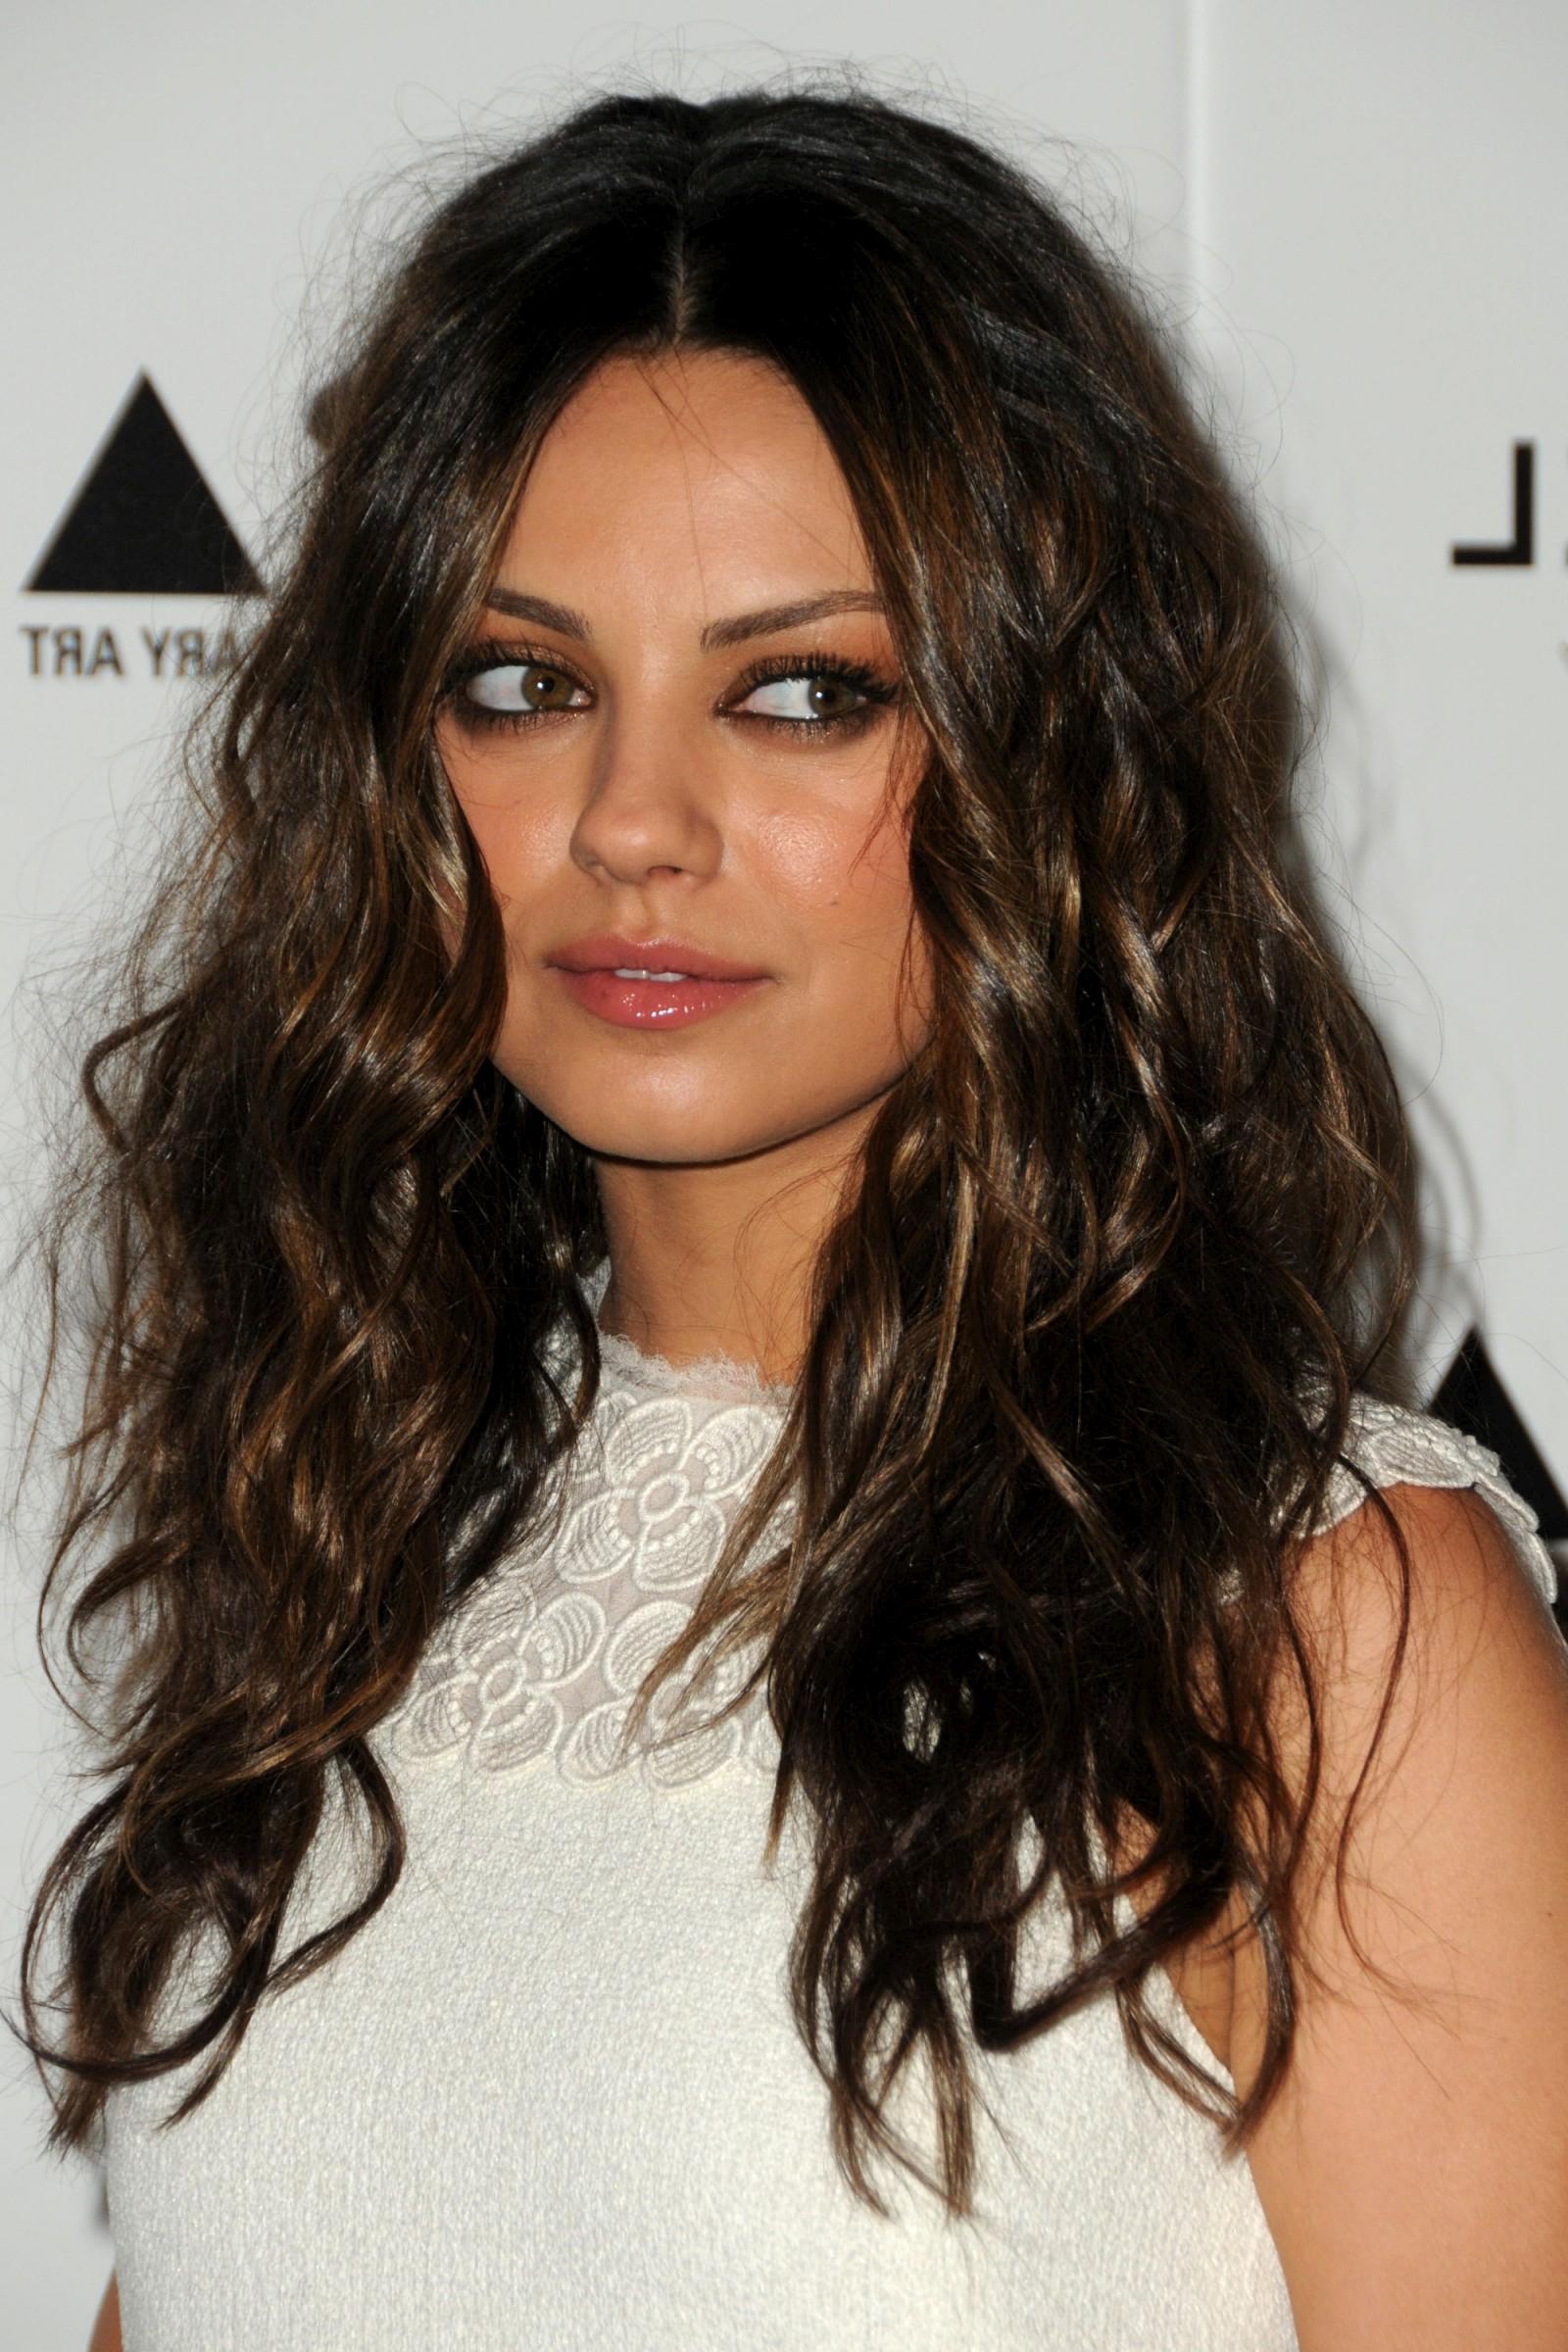 Mila Kunis Hairstyles   Hairstylo With Regard To Mila Kunis Short Hairstyles (View 25 of 25)